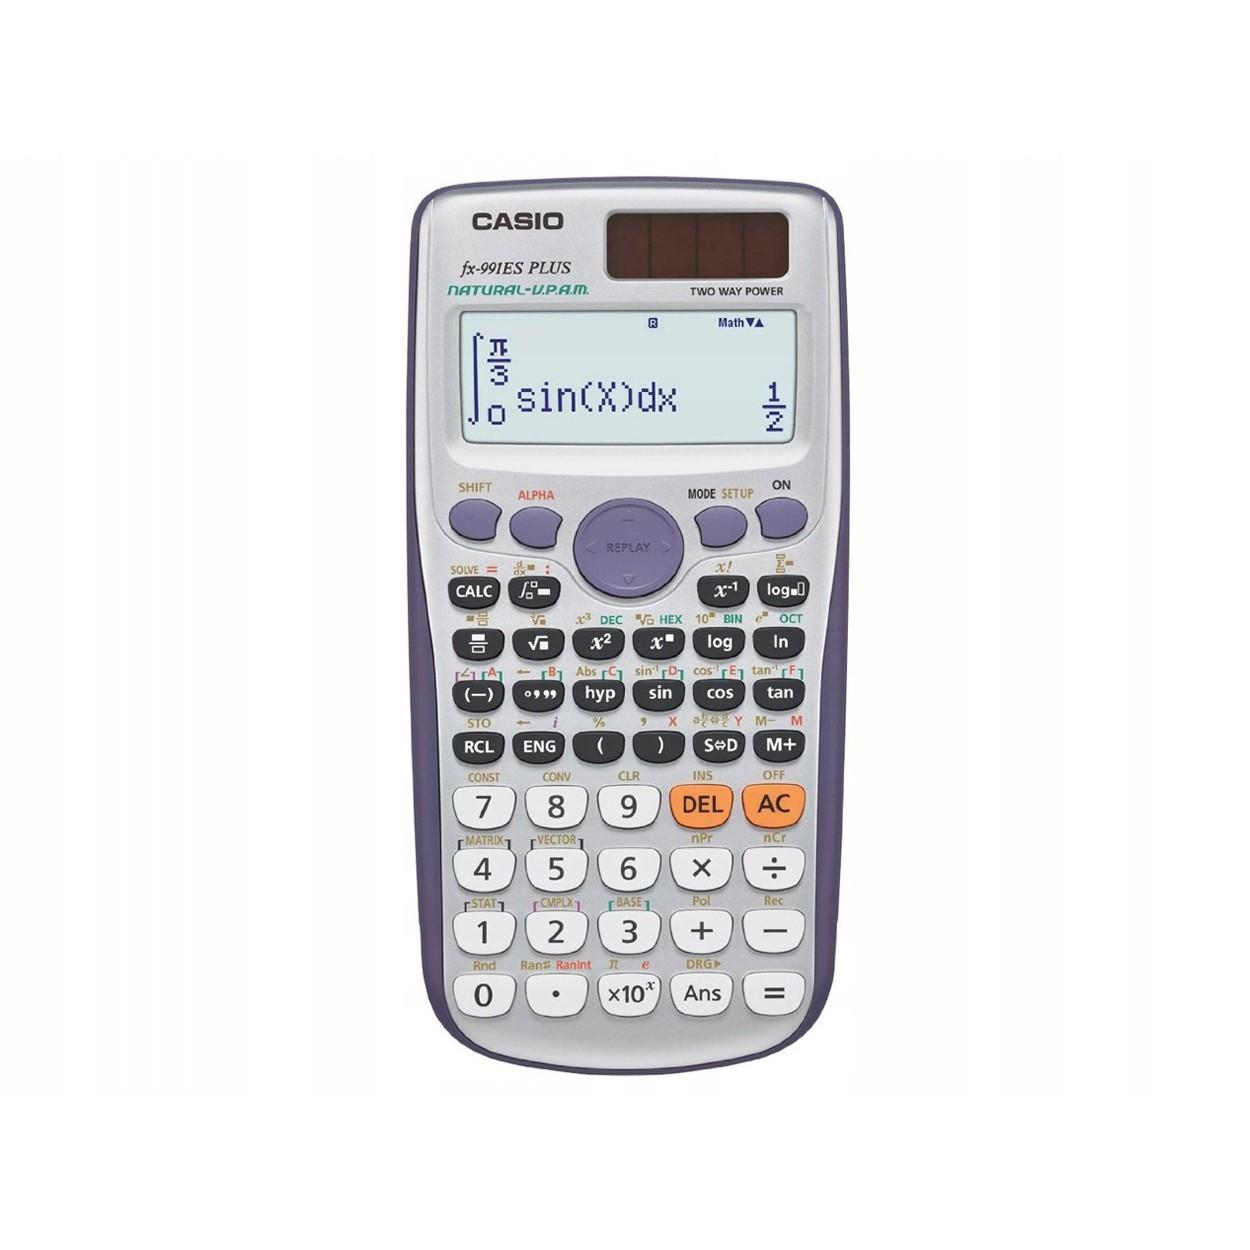 vedecká kalkulačka casio fx-991es derivácie matice integrály megamix.sk